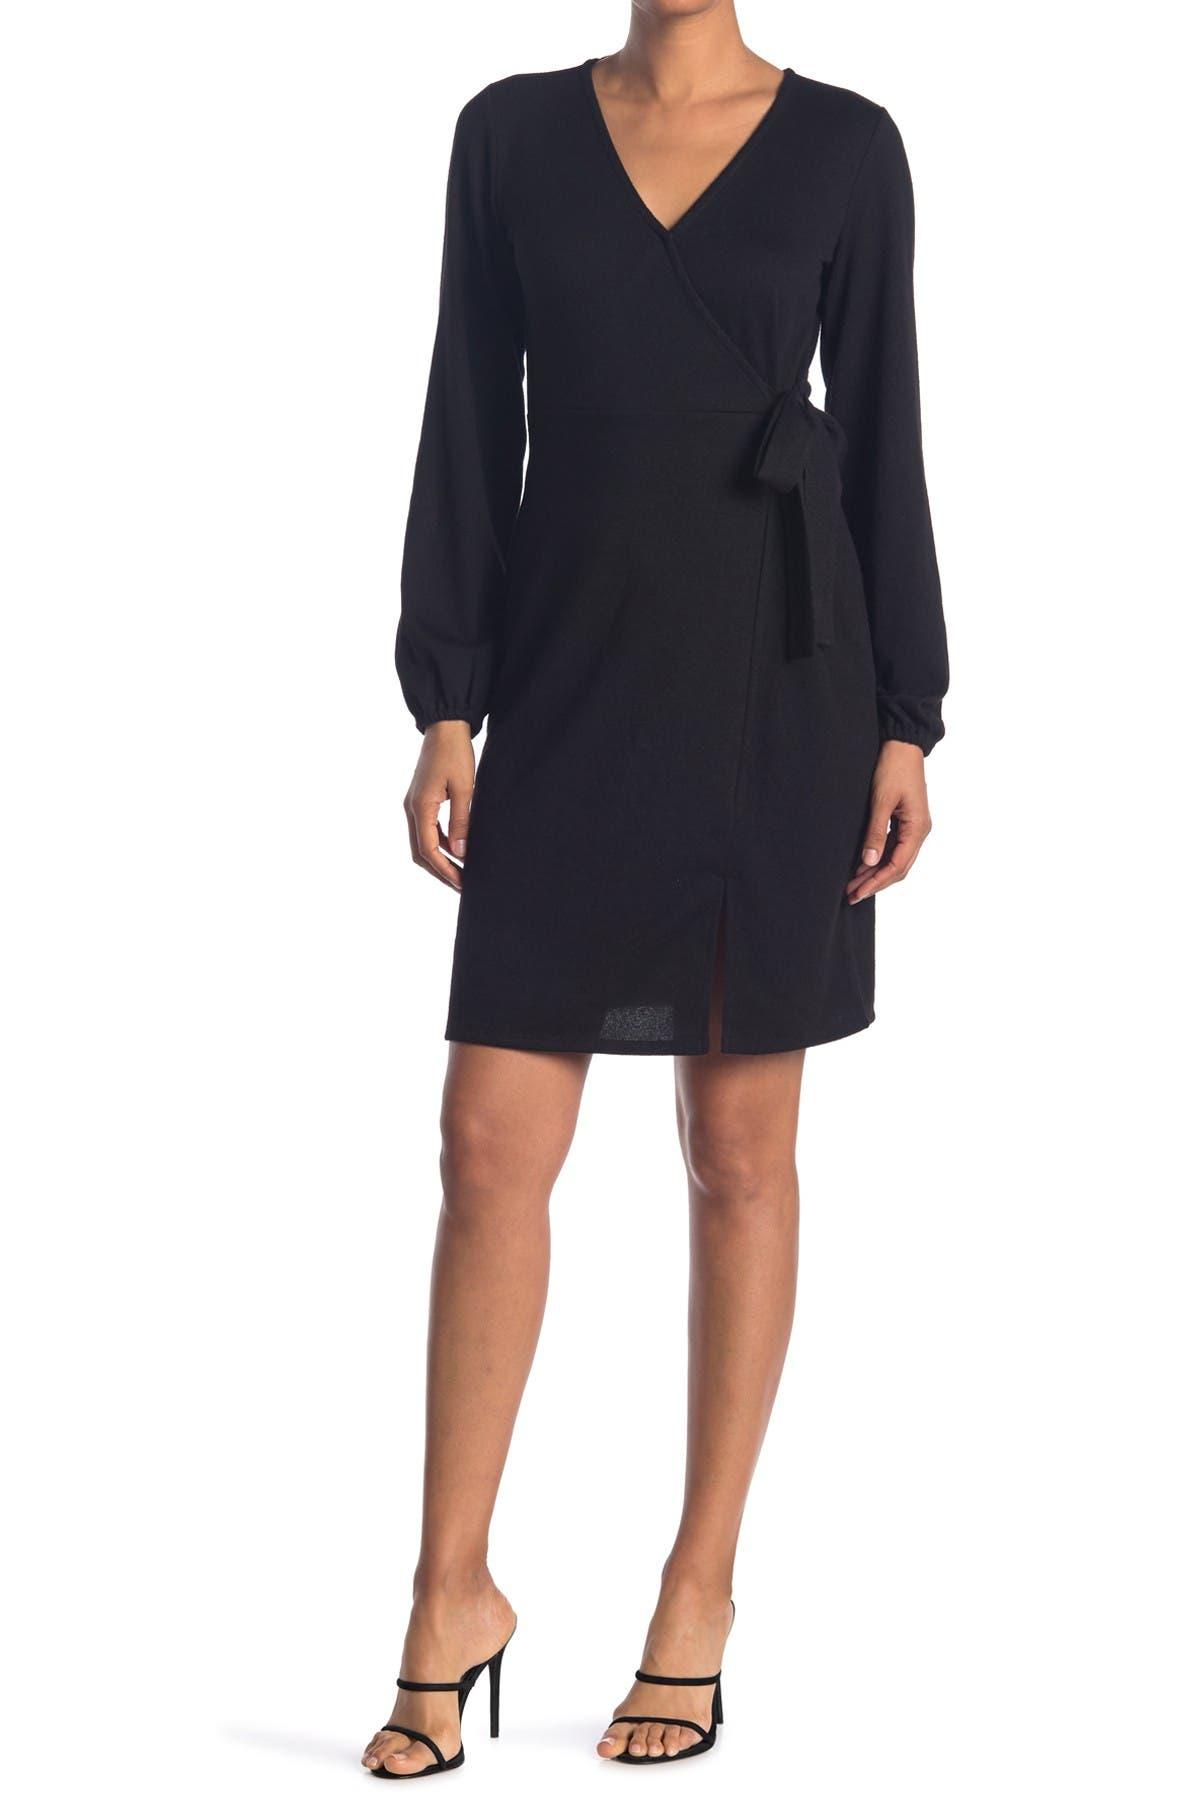 Image of Sanctuary Long Sleeve Wrap Dress